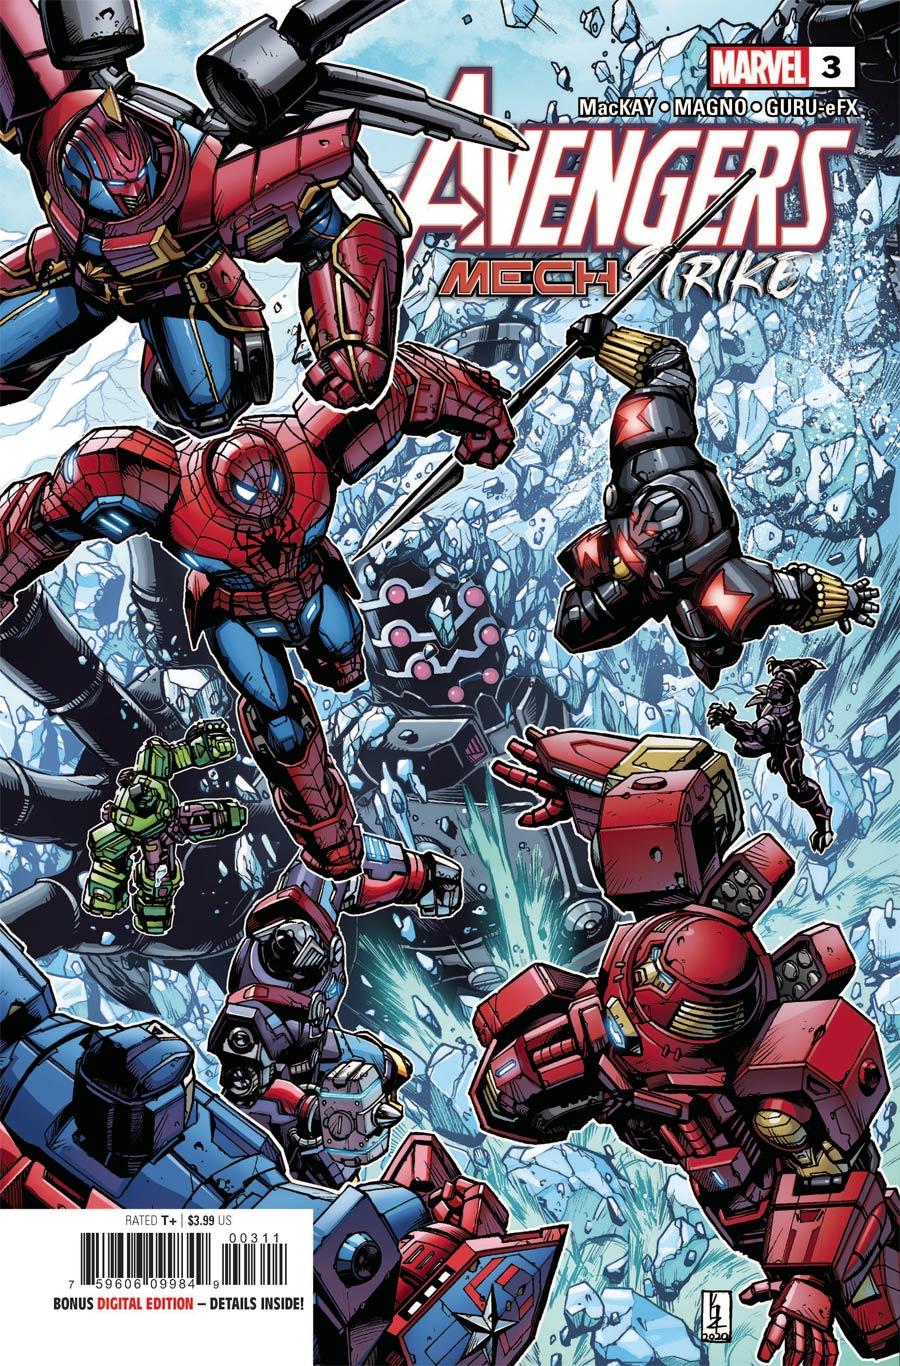 Avengers Mech Strike #3 Cover A Regular Kei Zama Cover